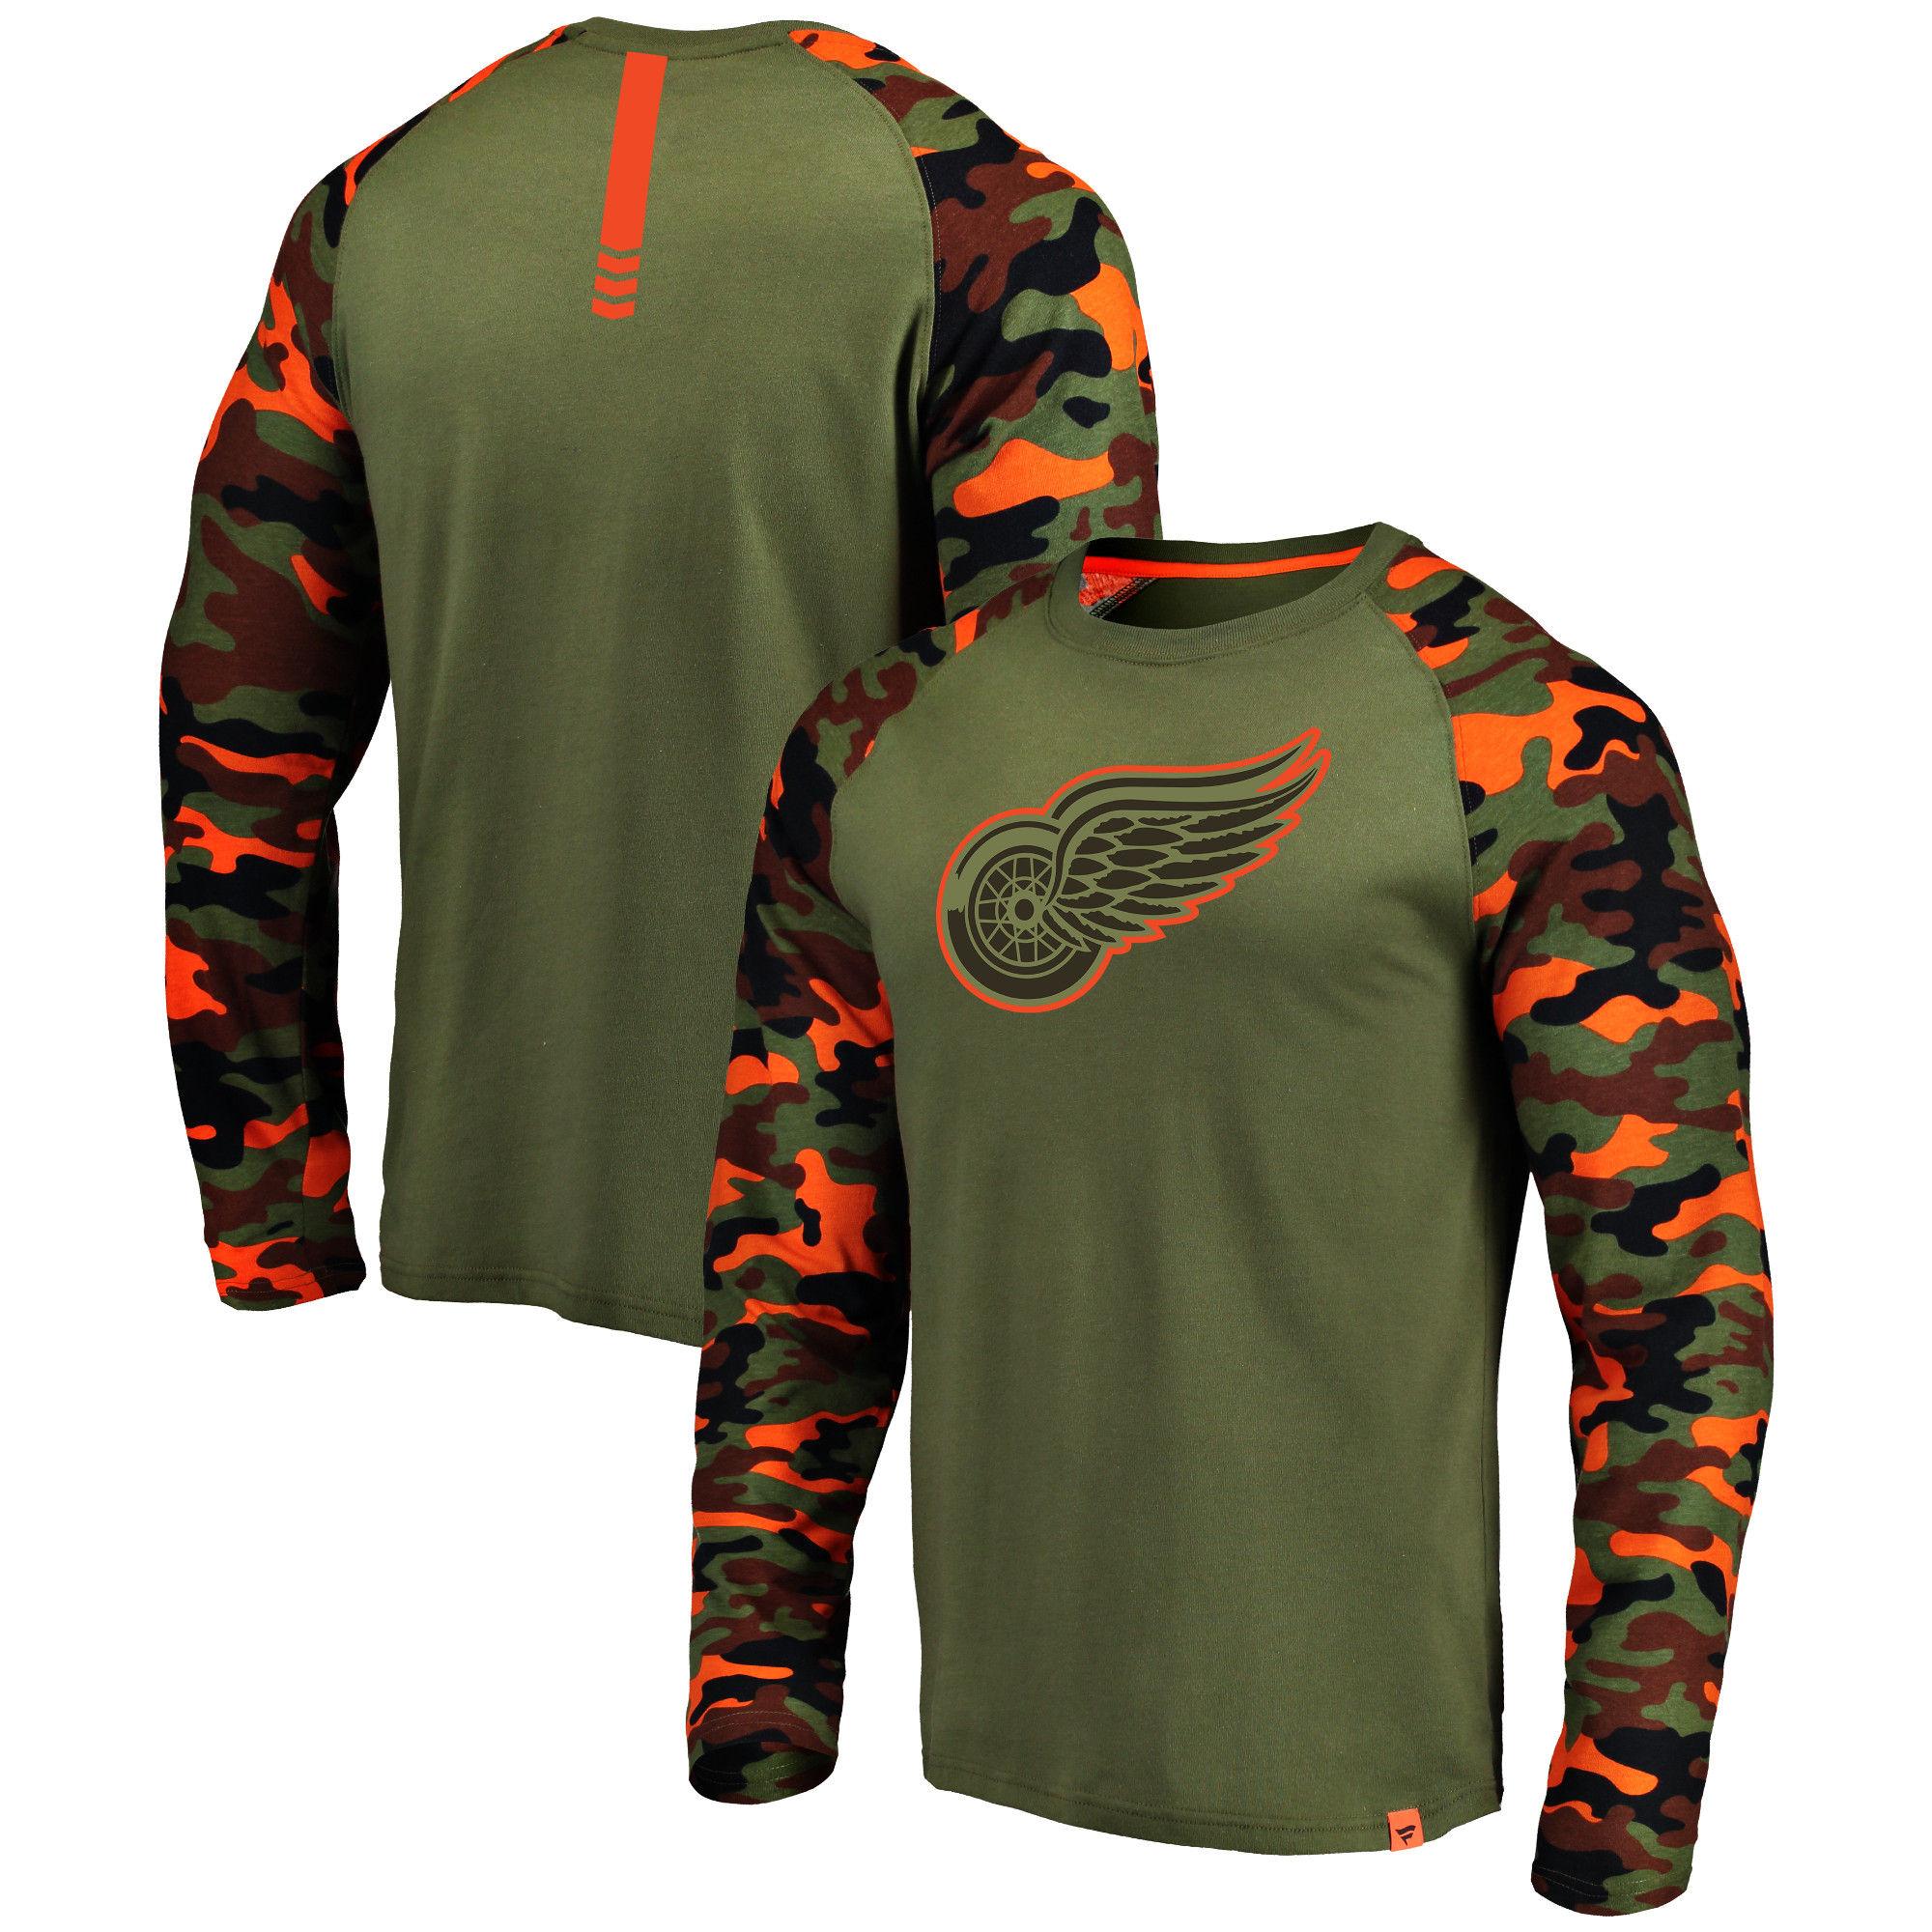 Detroit Red Wings Fanatics Branded Olive/Camo Recon Long Sleeve Raglan T-Shirt